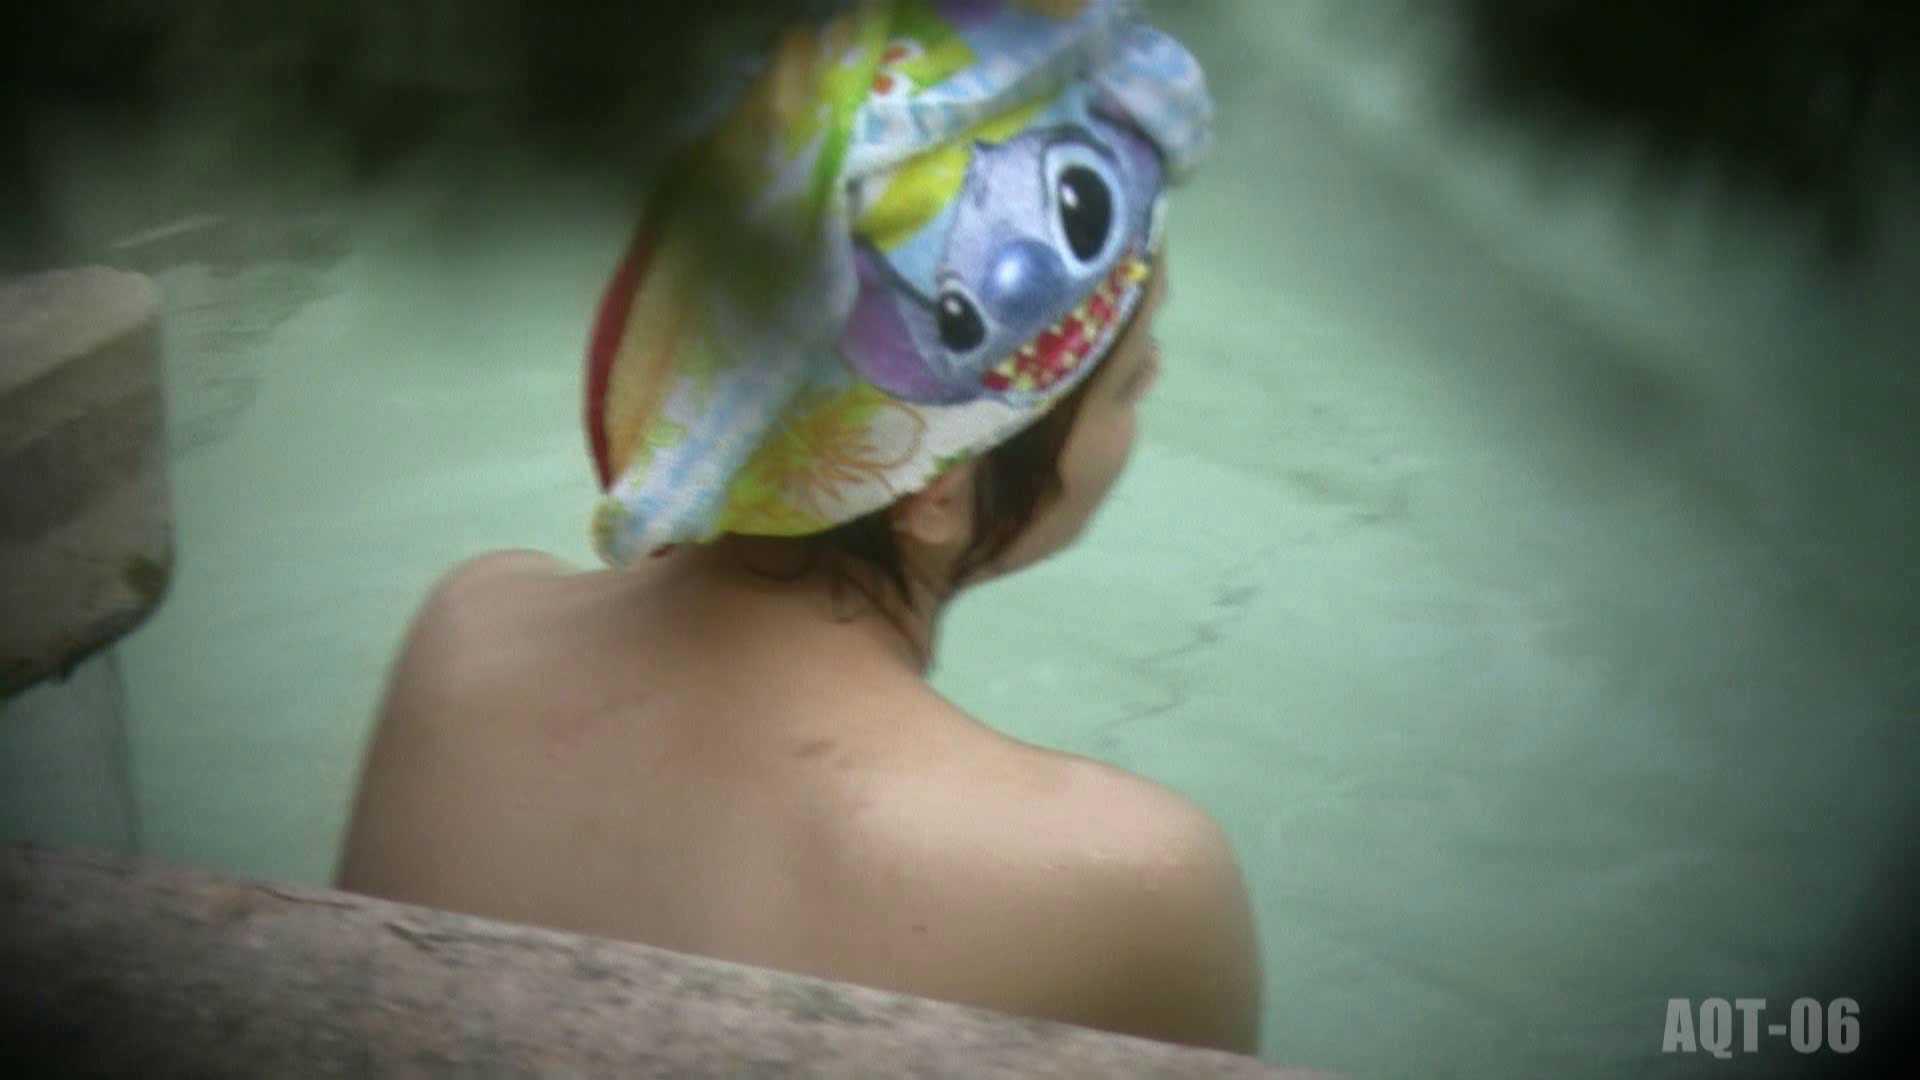 Aquaな露天風呂Vol.761 盗撮 オマンコ無修正動画無料 97連発 89